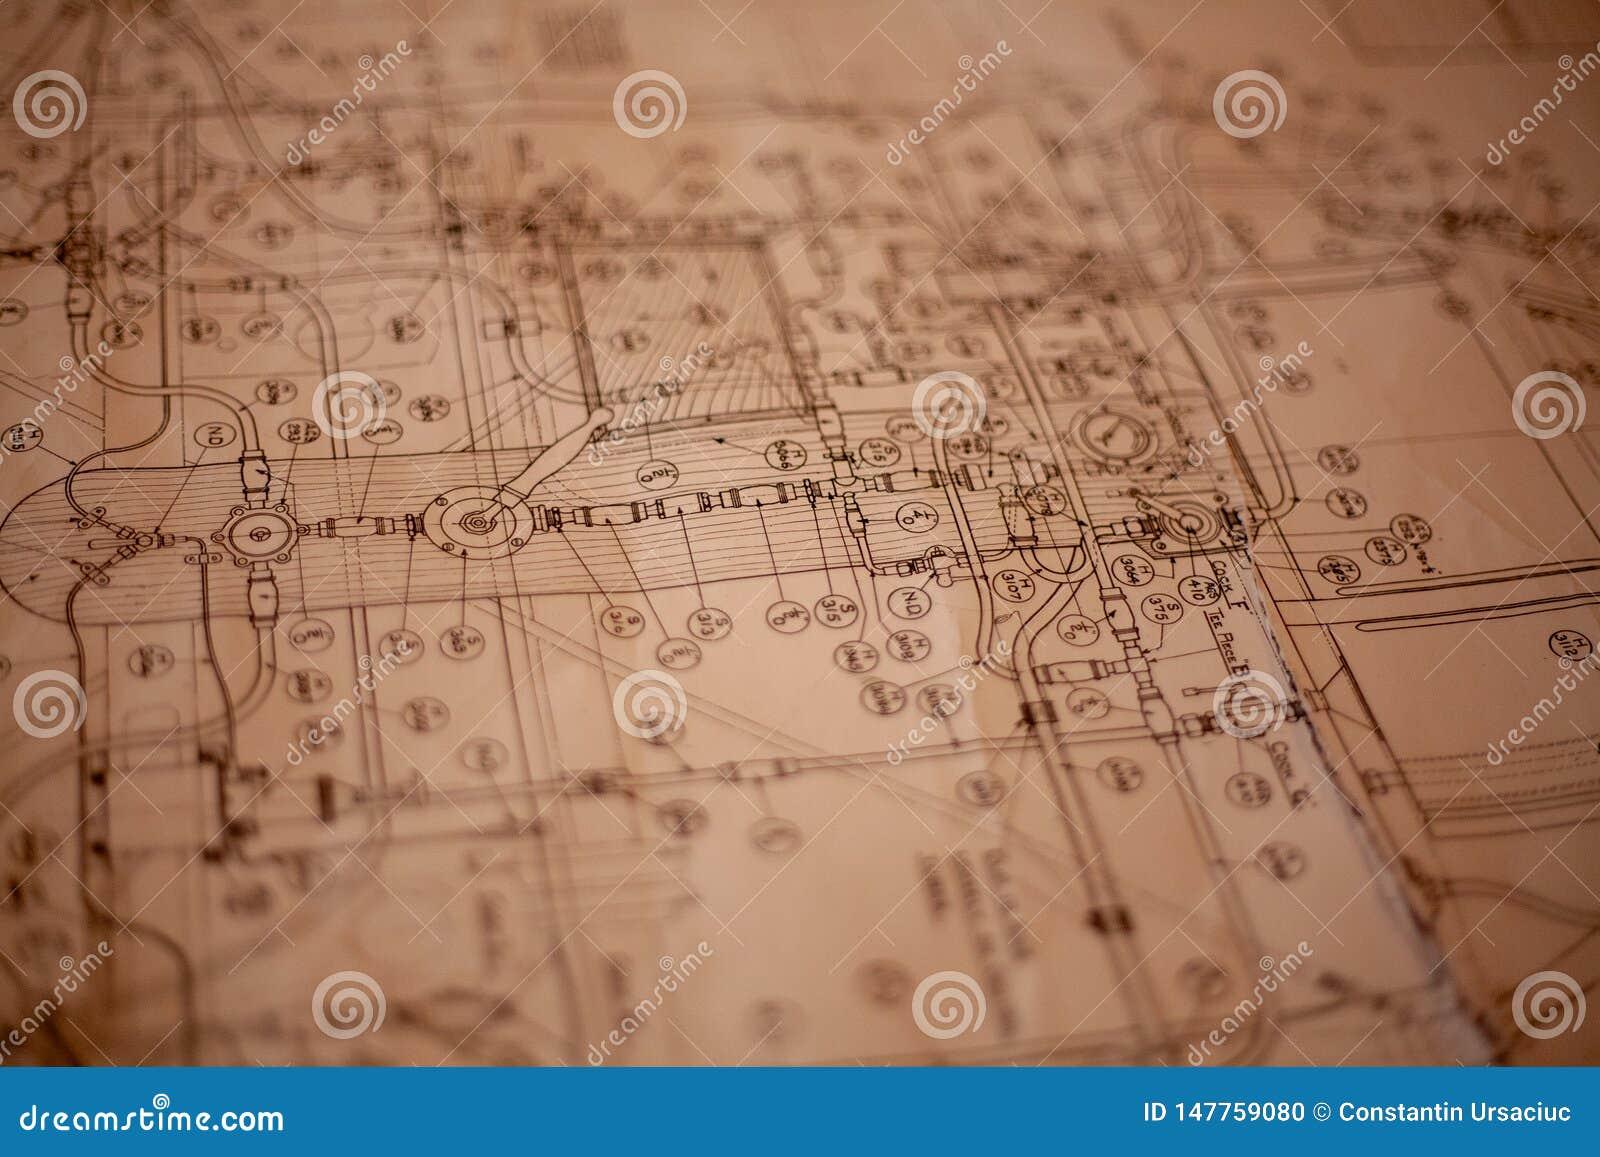 Papierowy plan